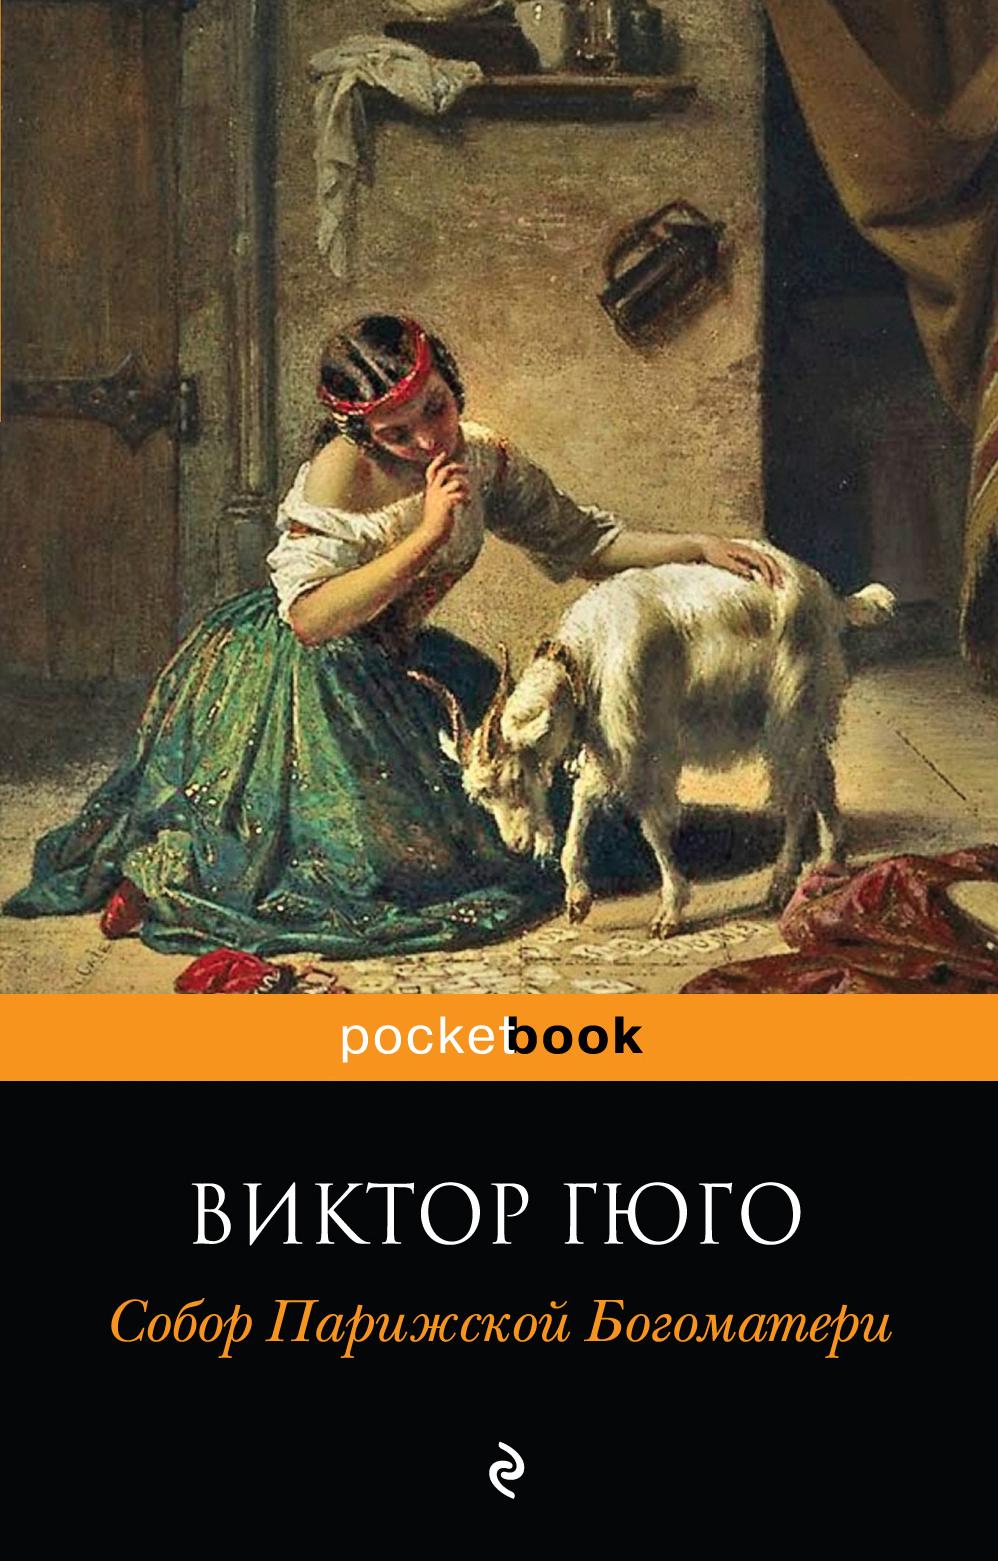 Книга собор парижской богоматери картинки